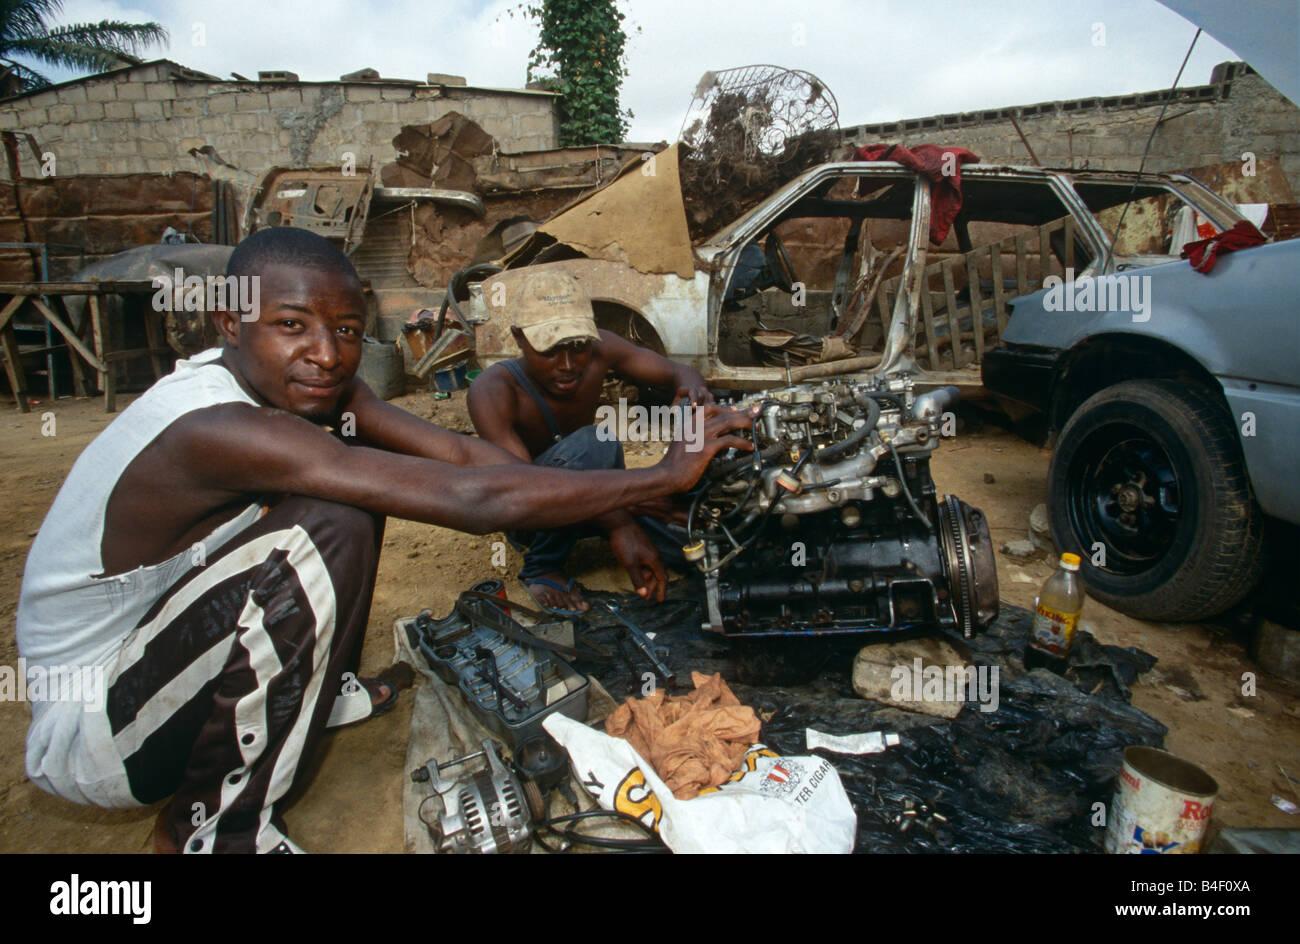 A mechanic workshop in Angola. Stock Photo